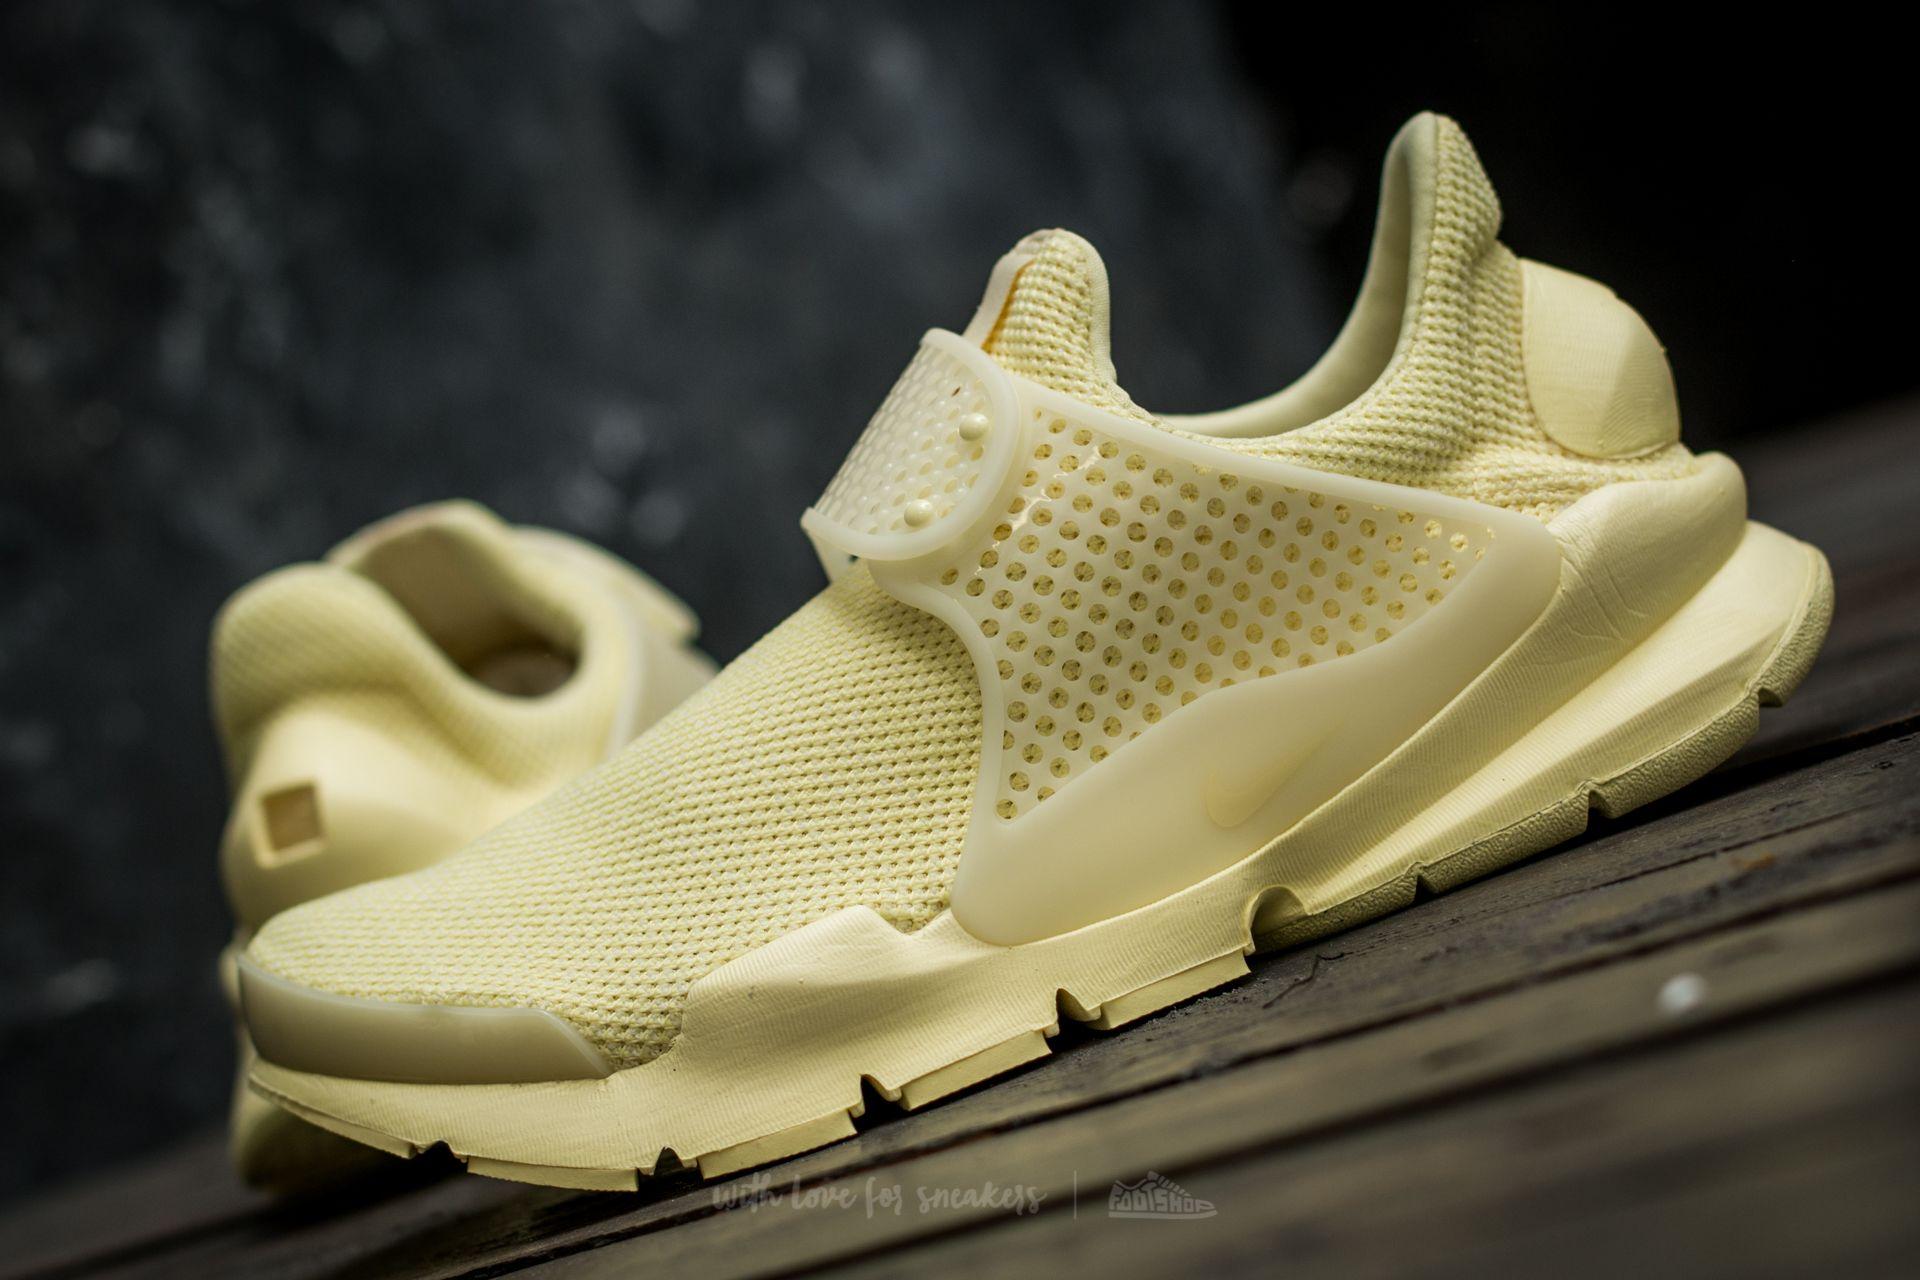 timeless design 64df4 03b44 Nike Sock Dart Br Lemon Chiffon/ Lemon Chiffon | Footshop